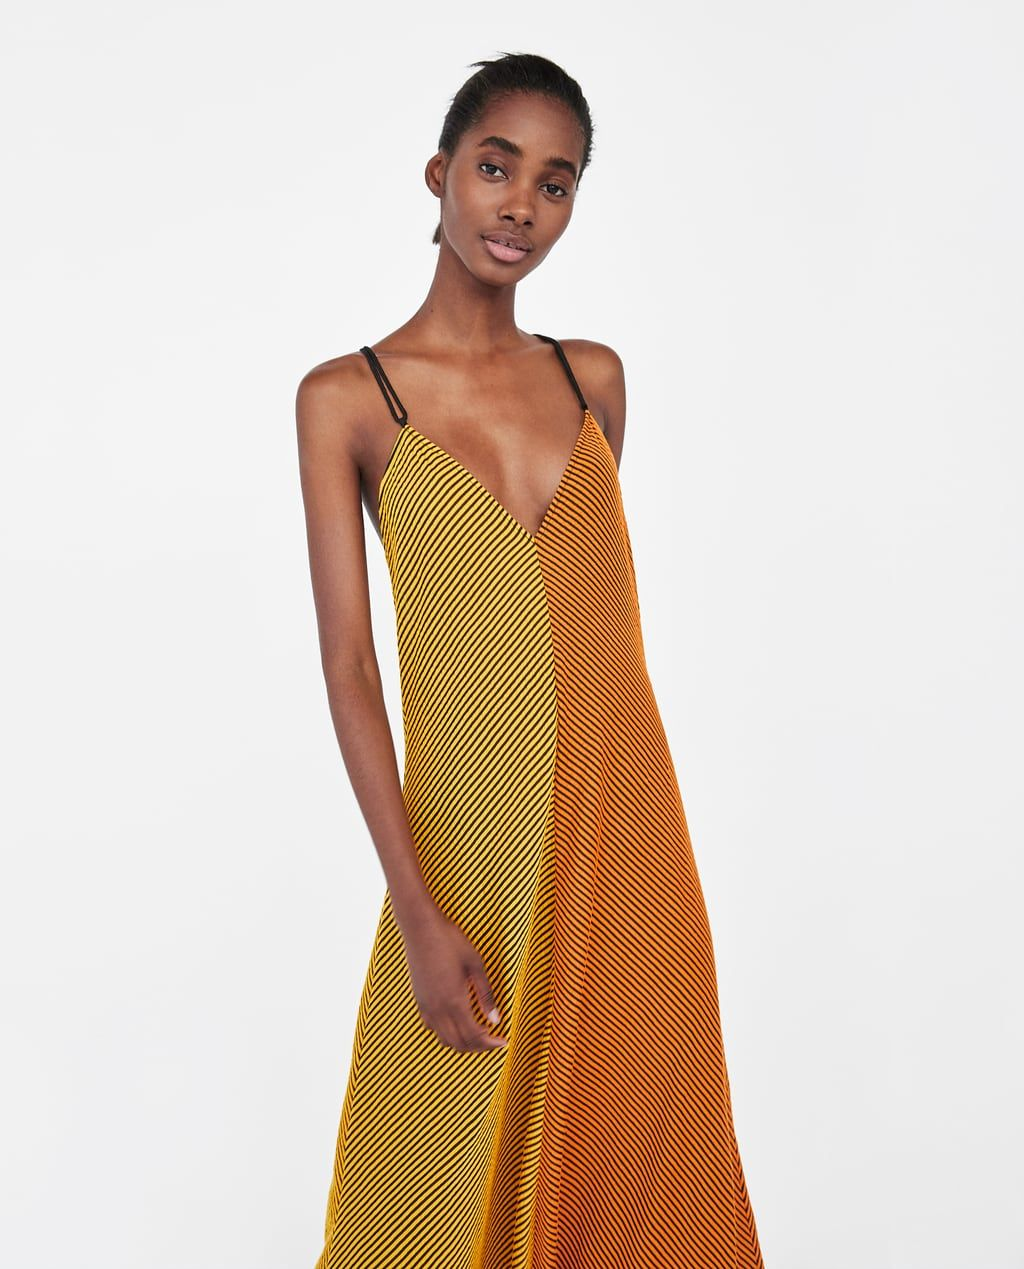 392b5e437e3 Image 2 of TWO-TONE STRIPED ASYMMETRIC DRESS from Zara